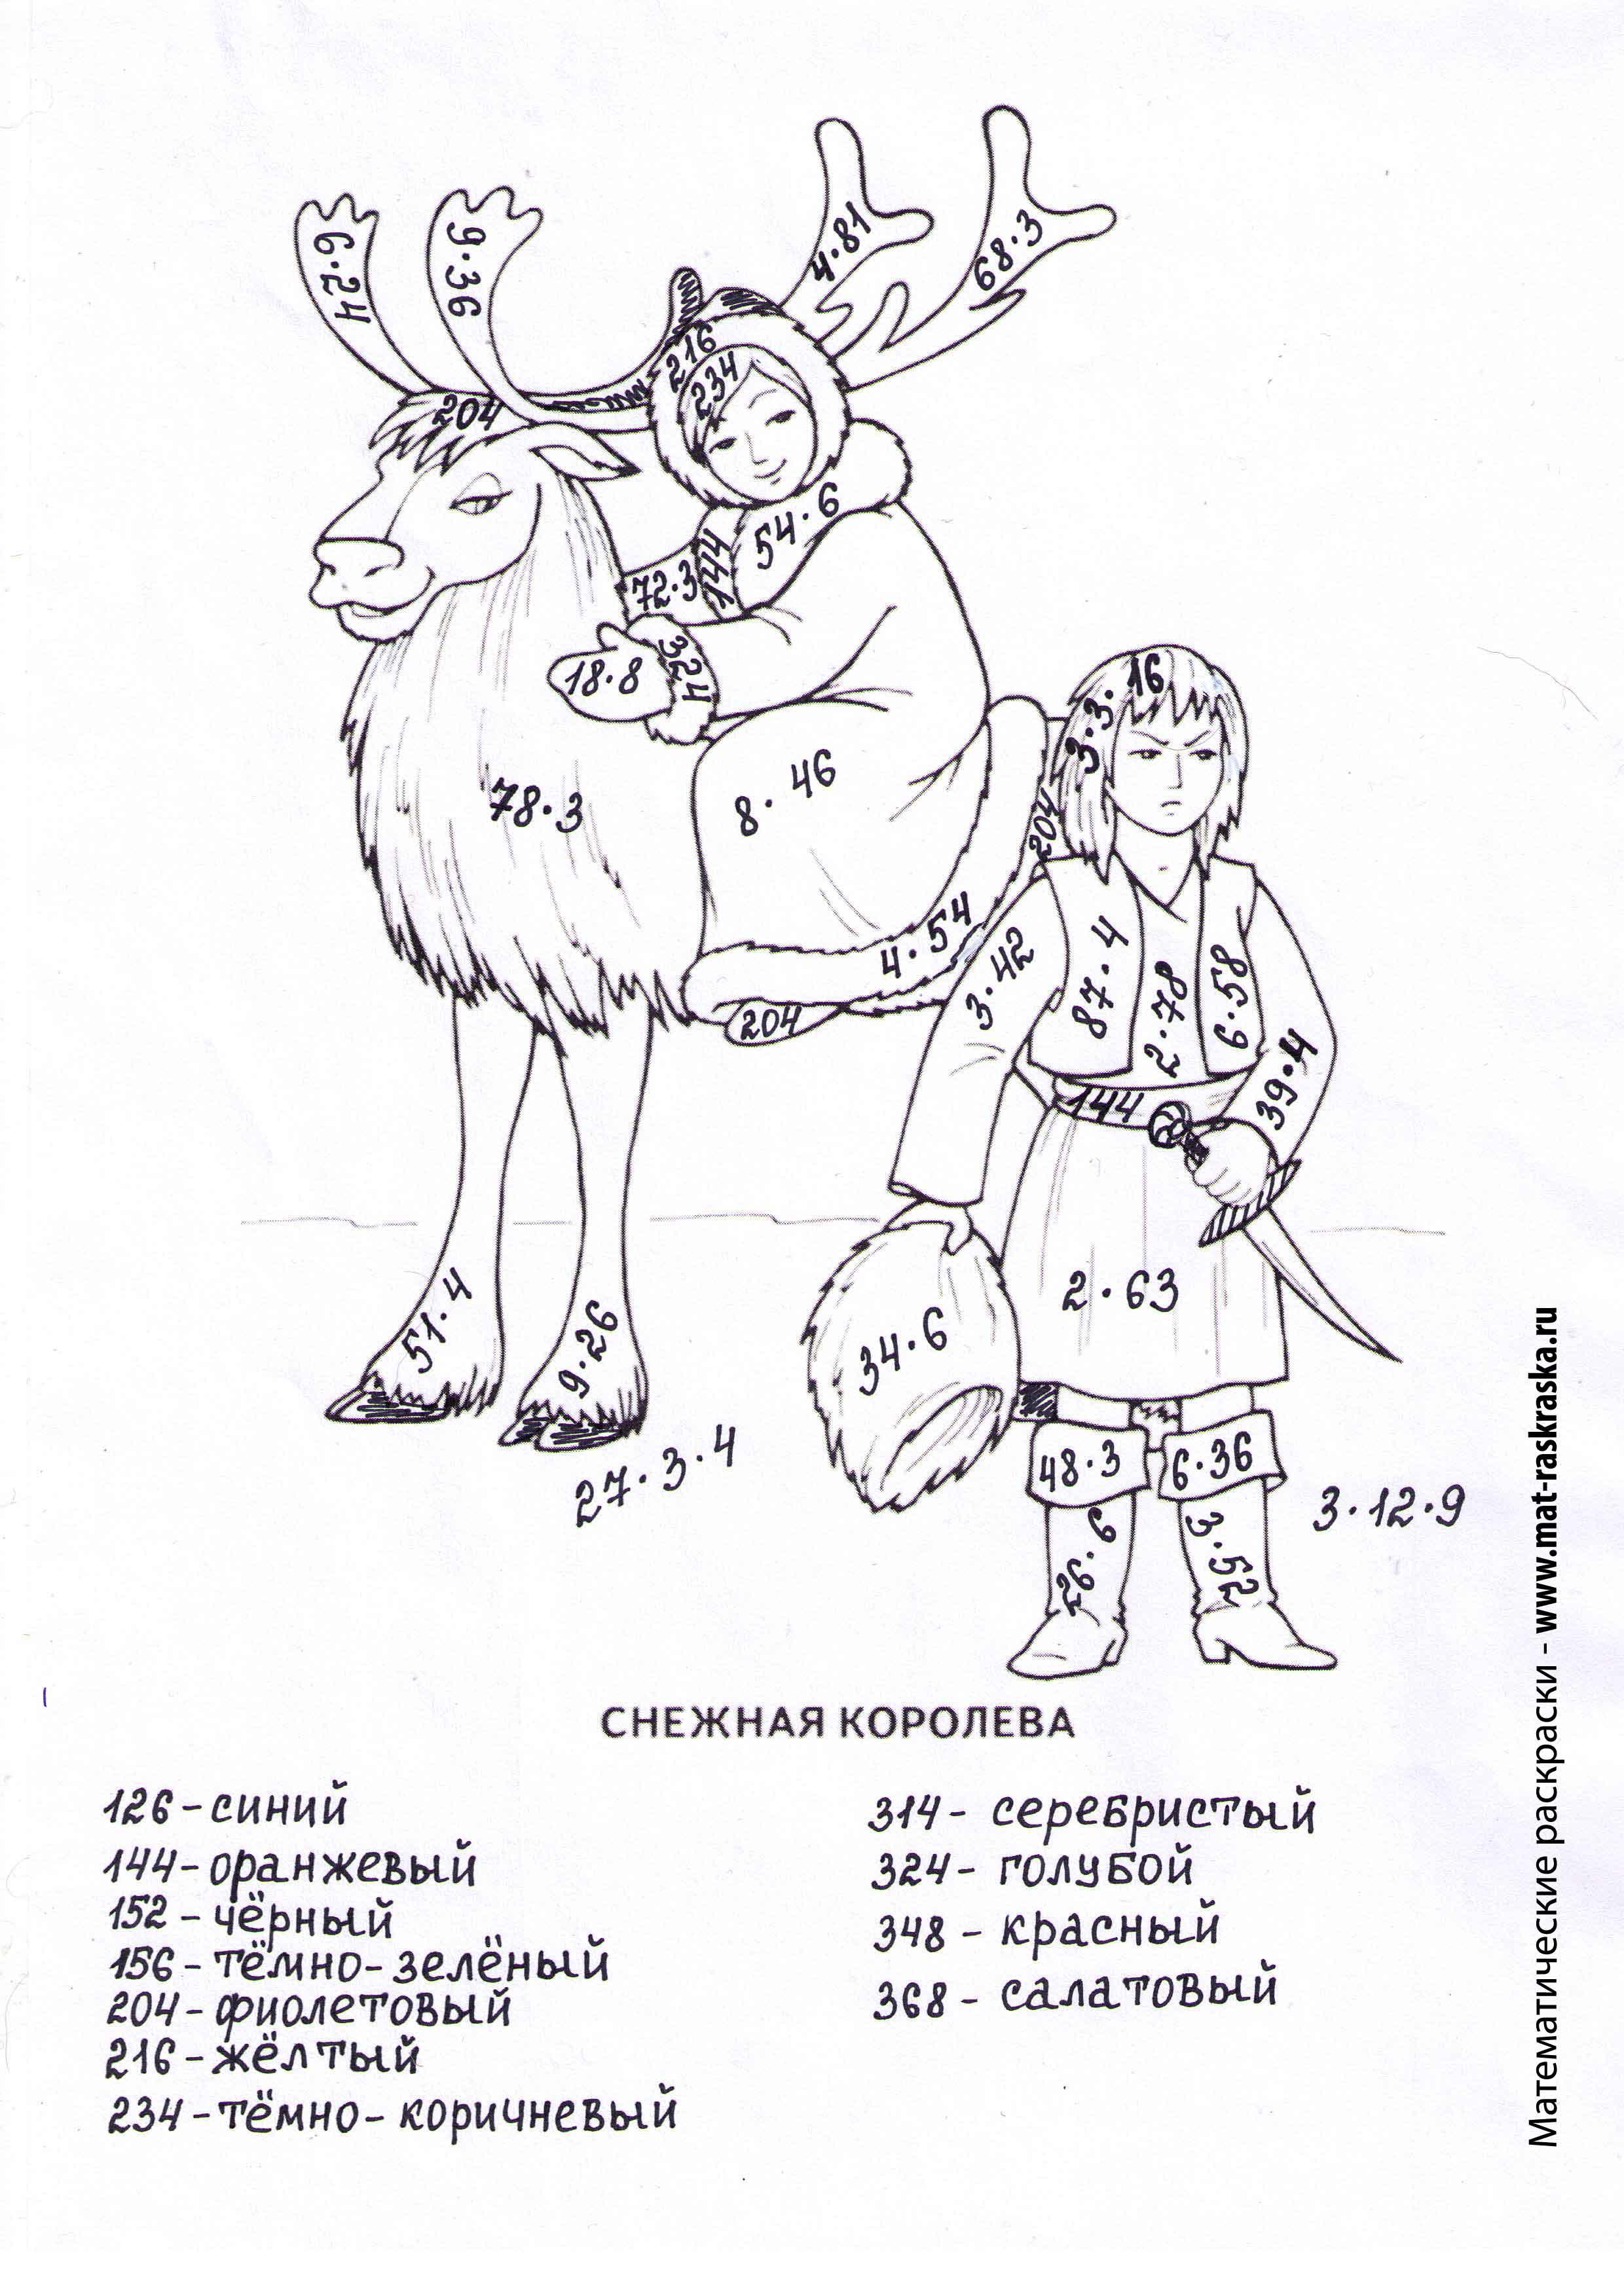 http://www.mat-raskraska.ru/images/stories/Raskraski/Vnetablichnoe-umnozenie-delenie/sneg-koroleva-umnoz-2zn-na1zn_big.jpg